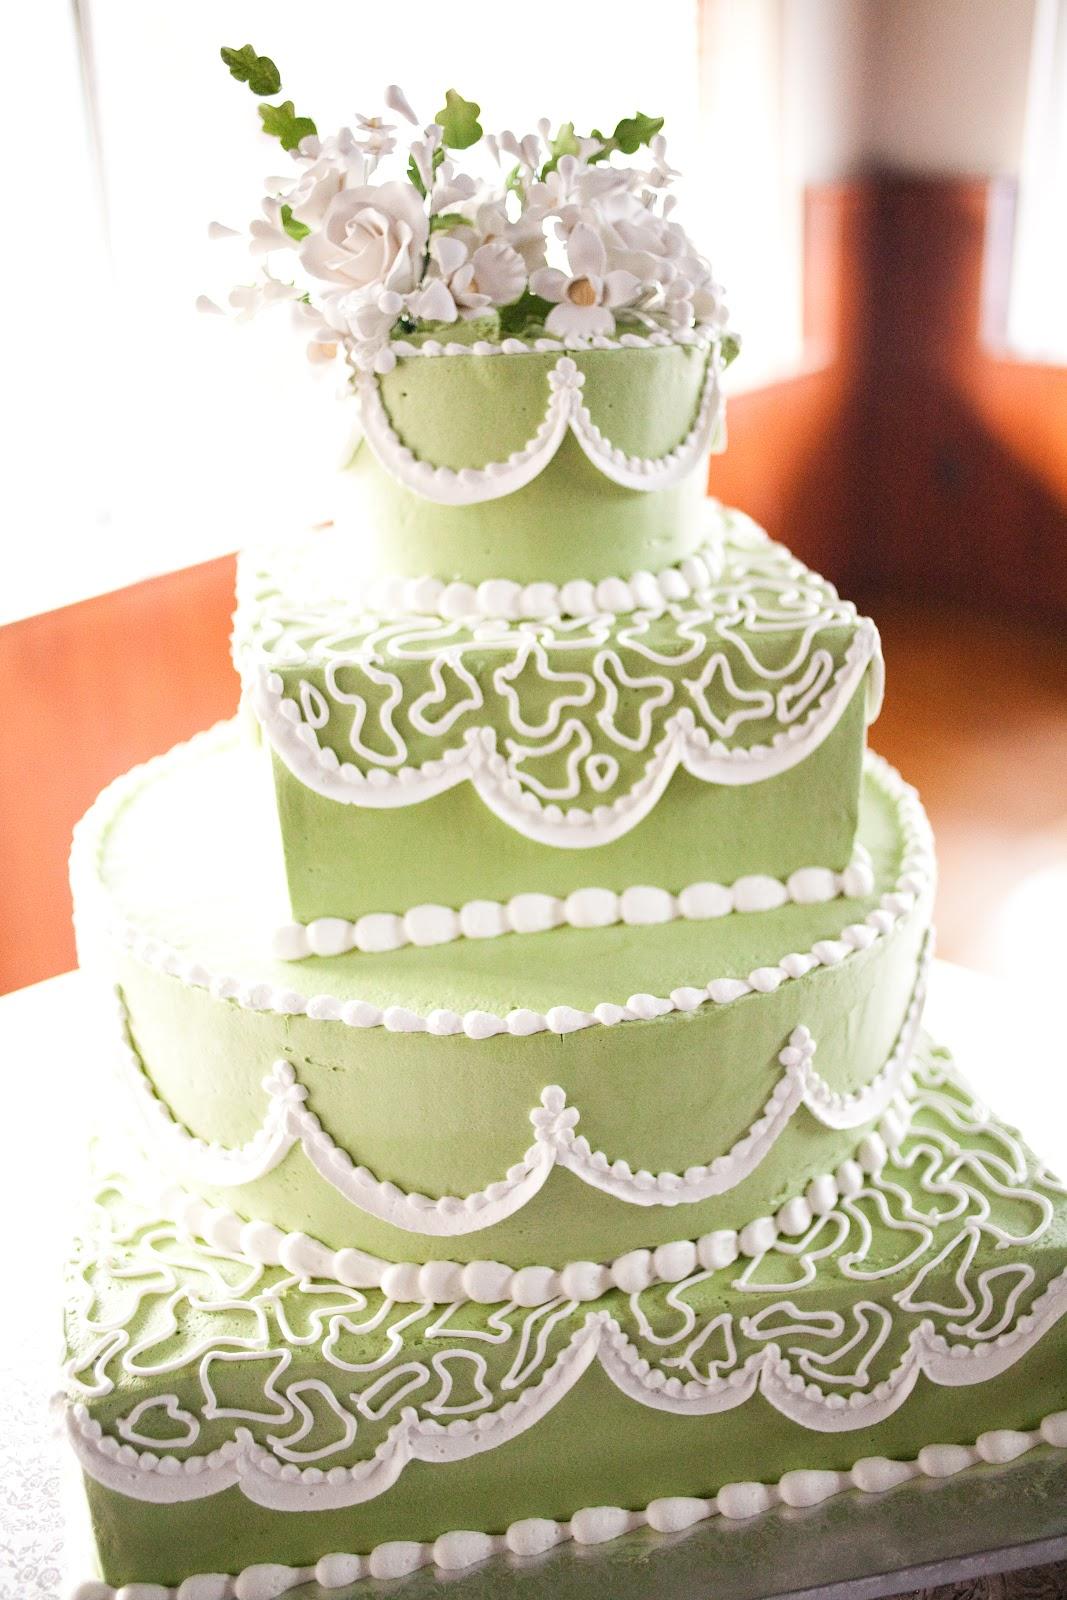 11 Publix Sheet Cakes Pricing Photo - Publix Wedding Cake Prices ...